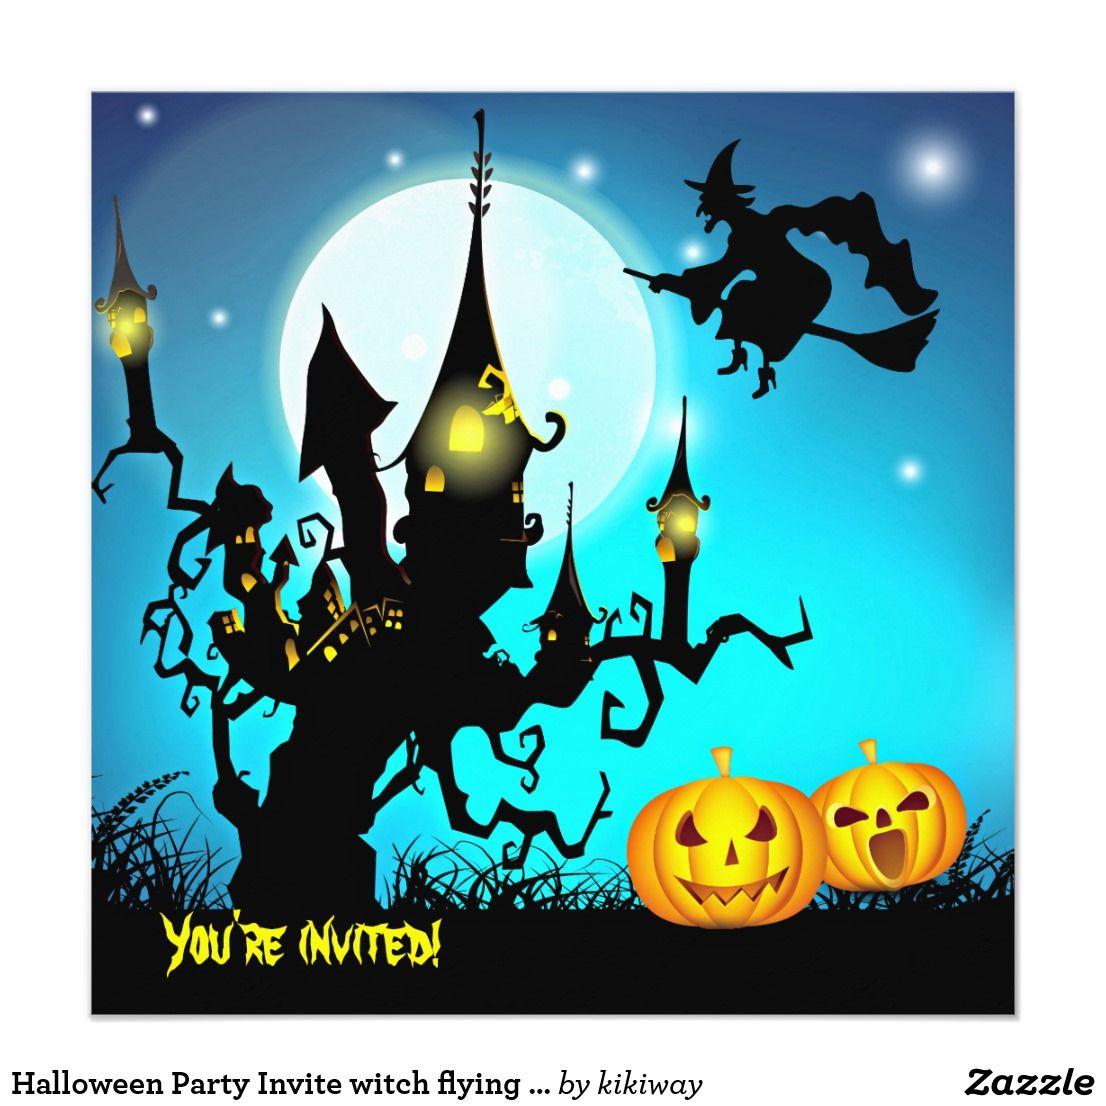 Pin by Jackie Suess on halloween invitations | Pinterest | Halloween ...